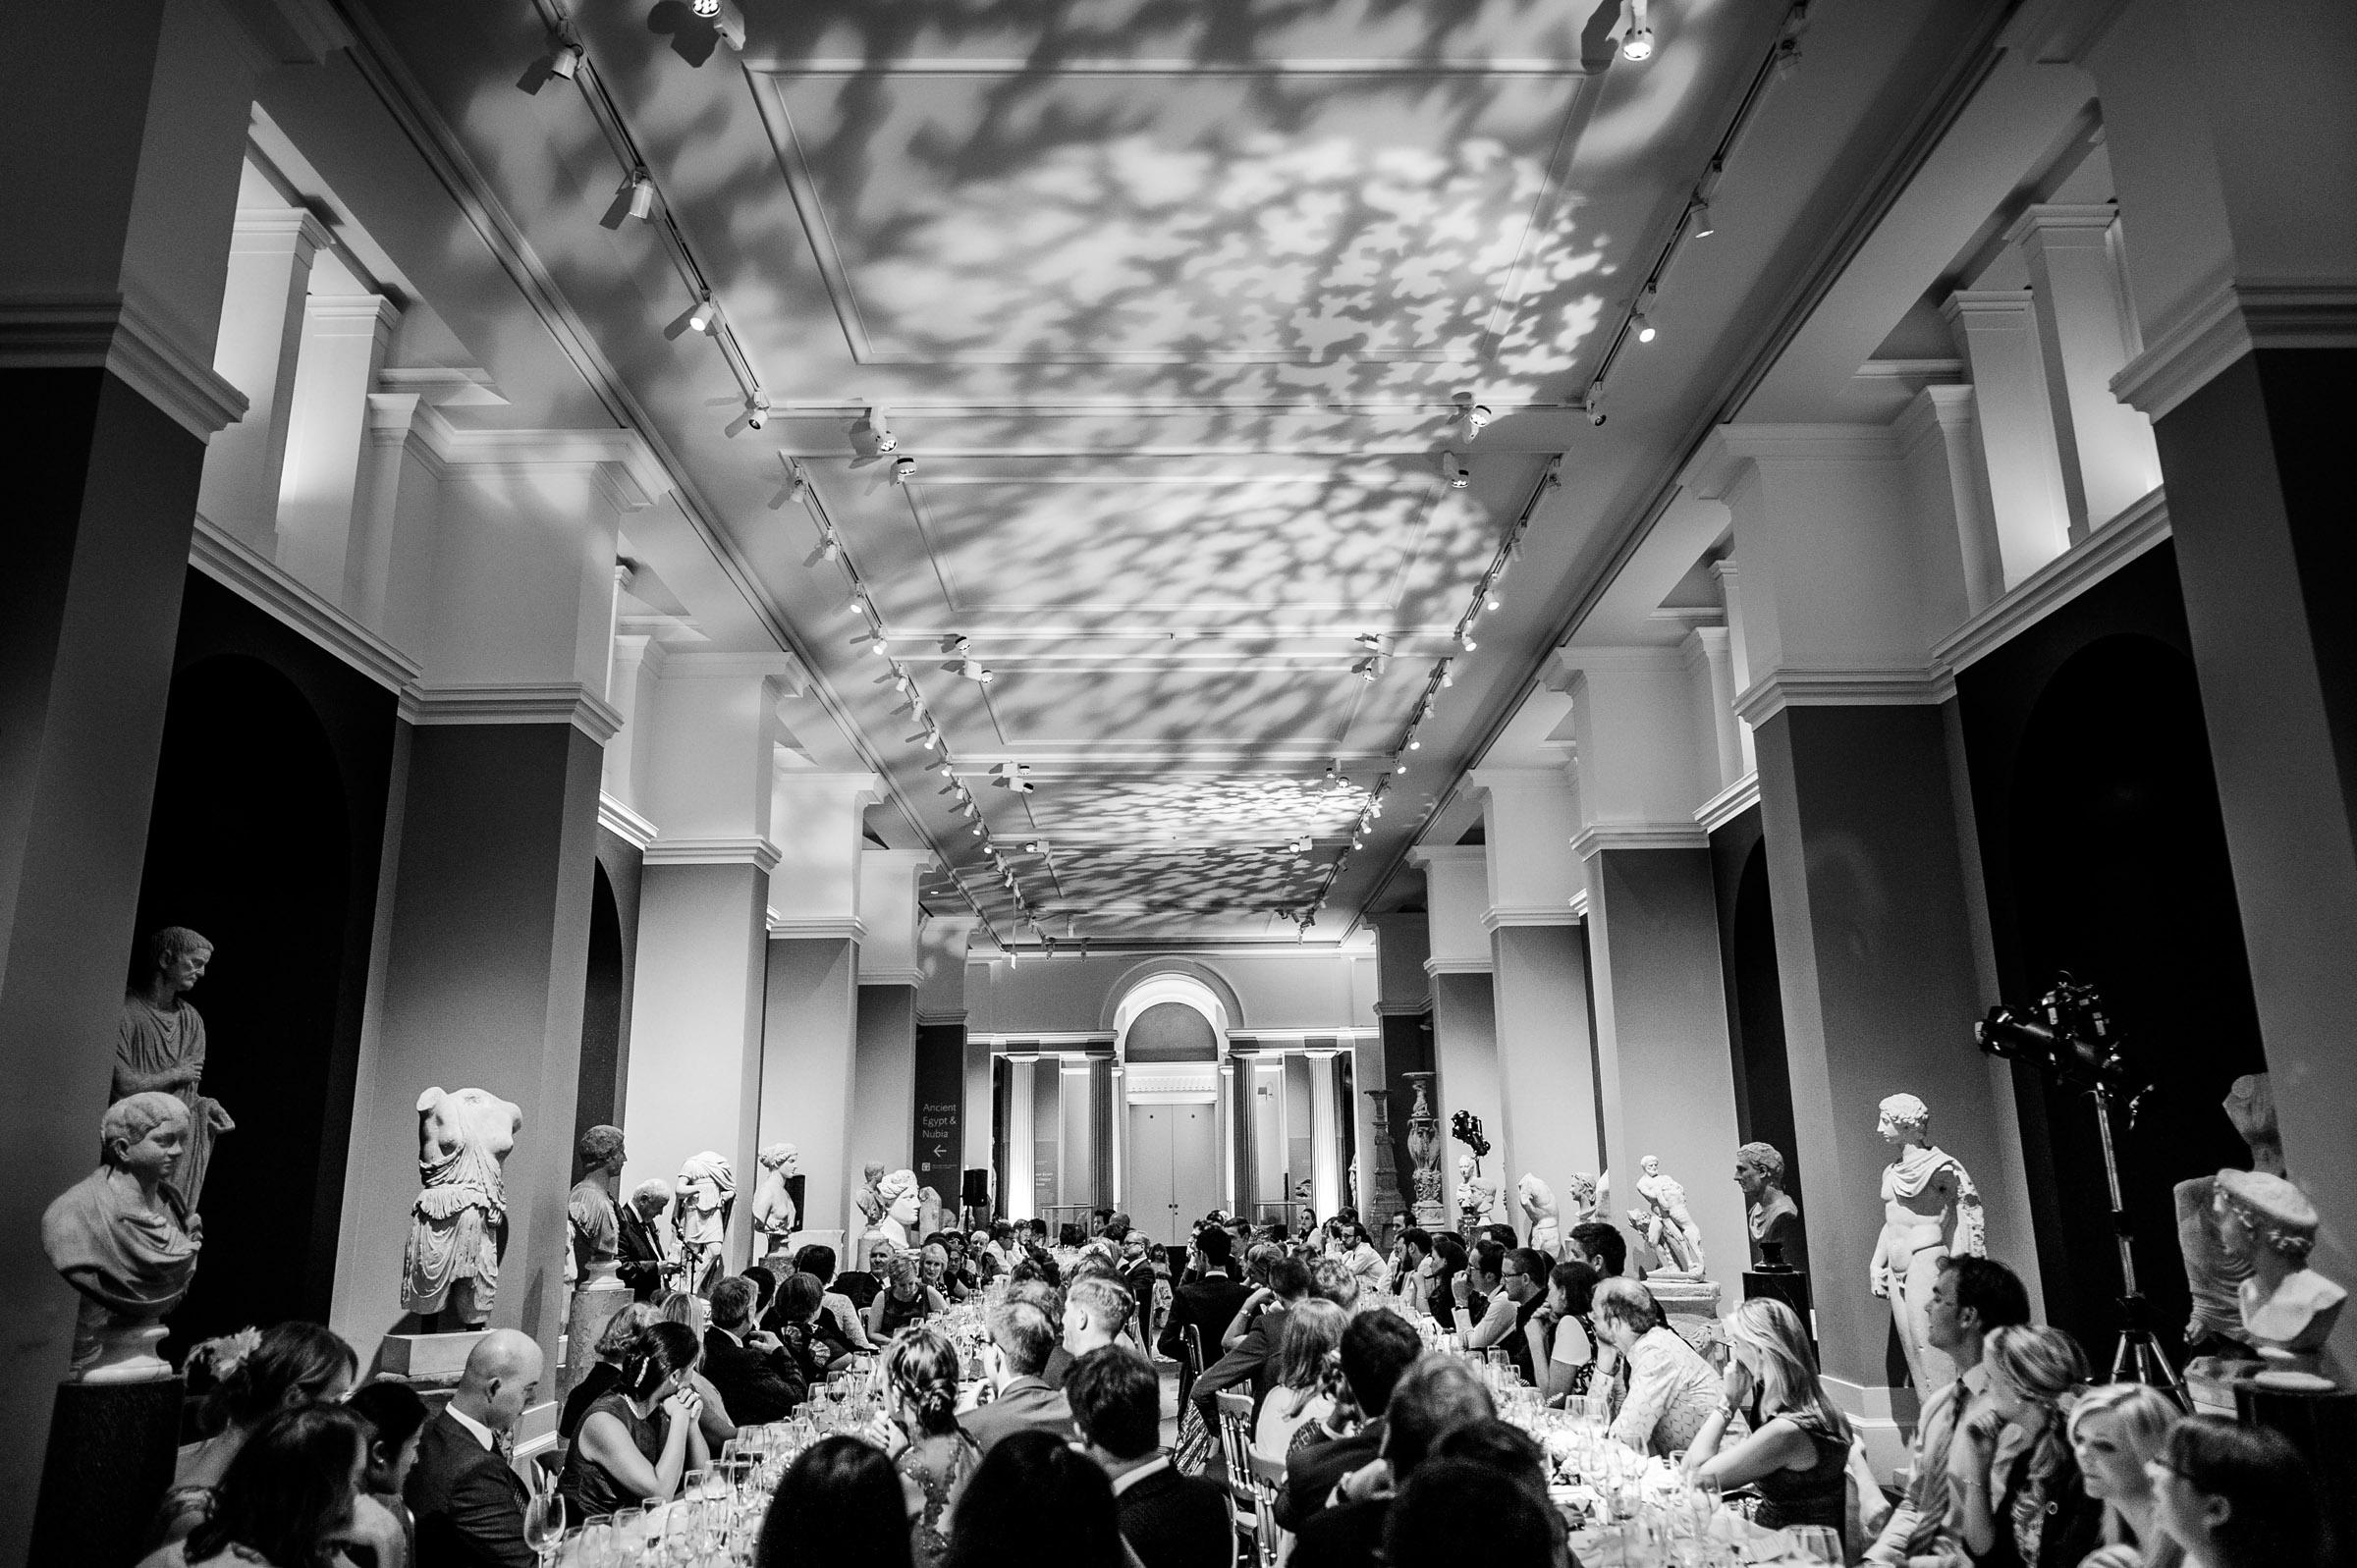 Ashmolean-Museum-Wedding-Pictures-0062.jpg